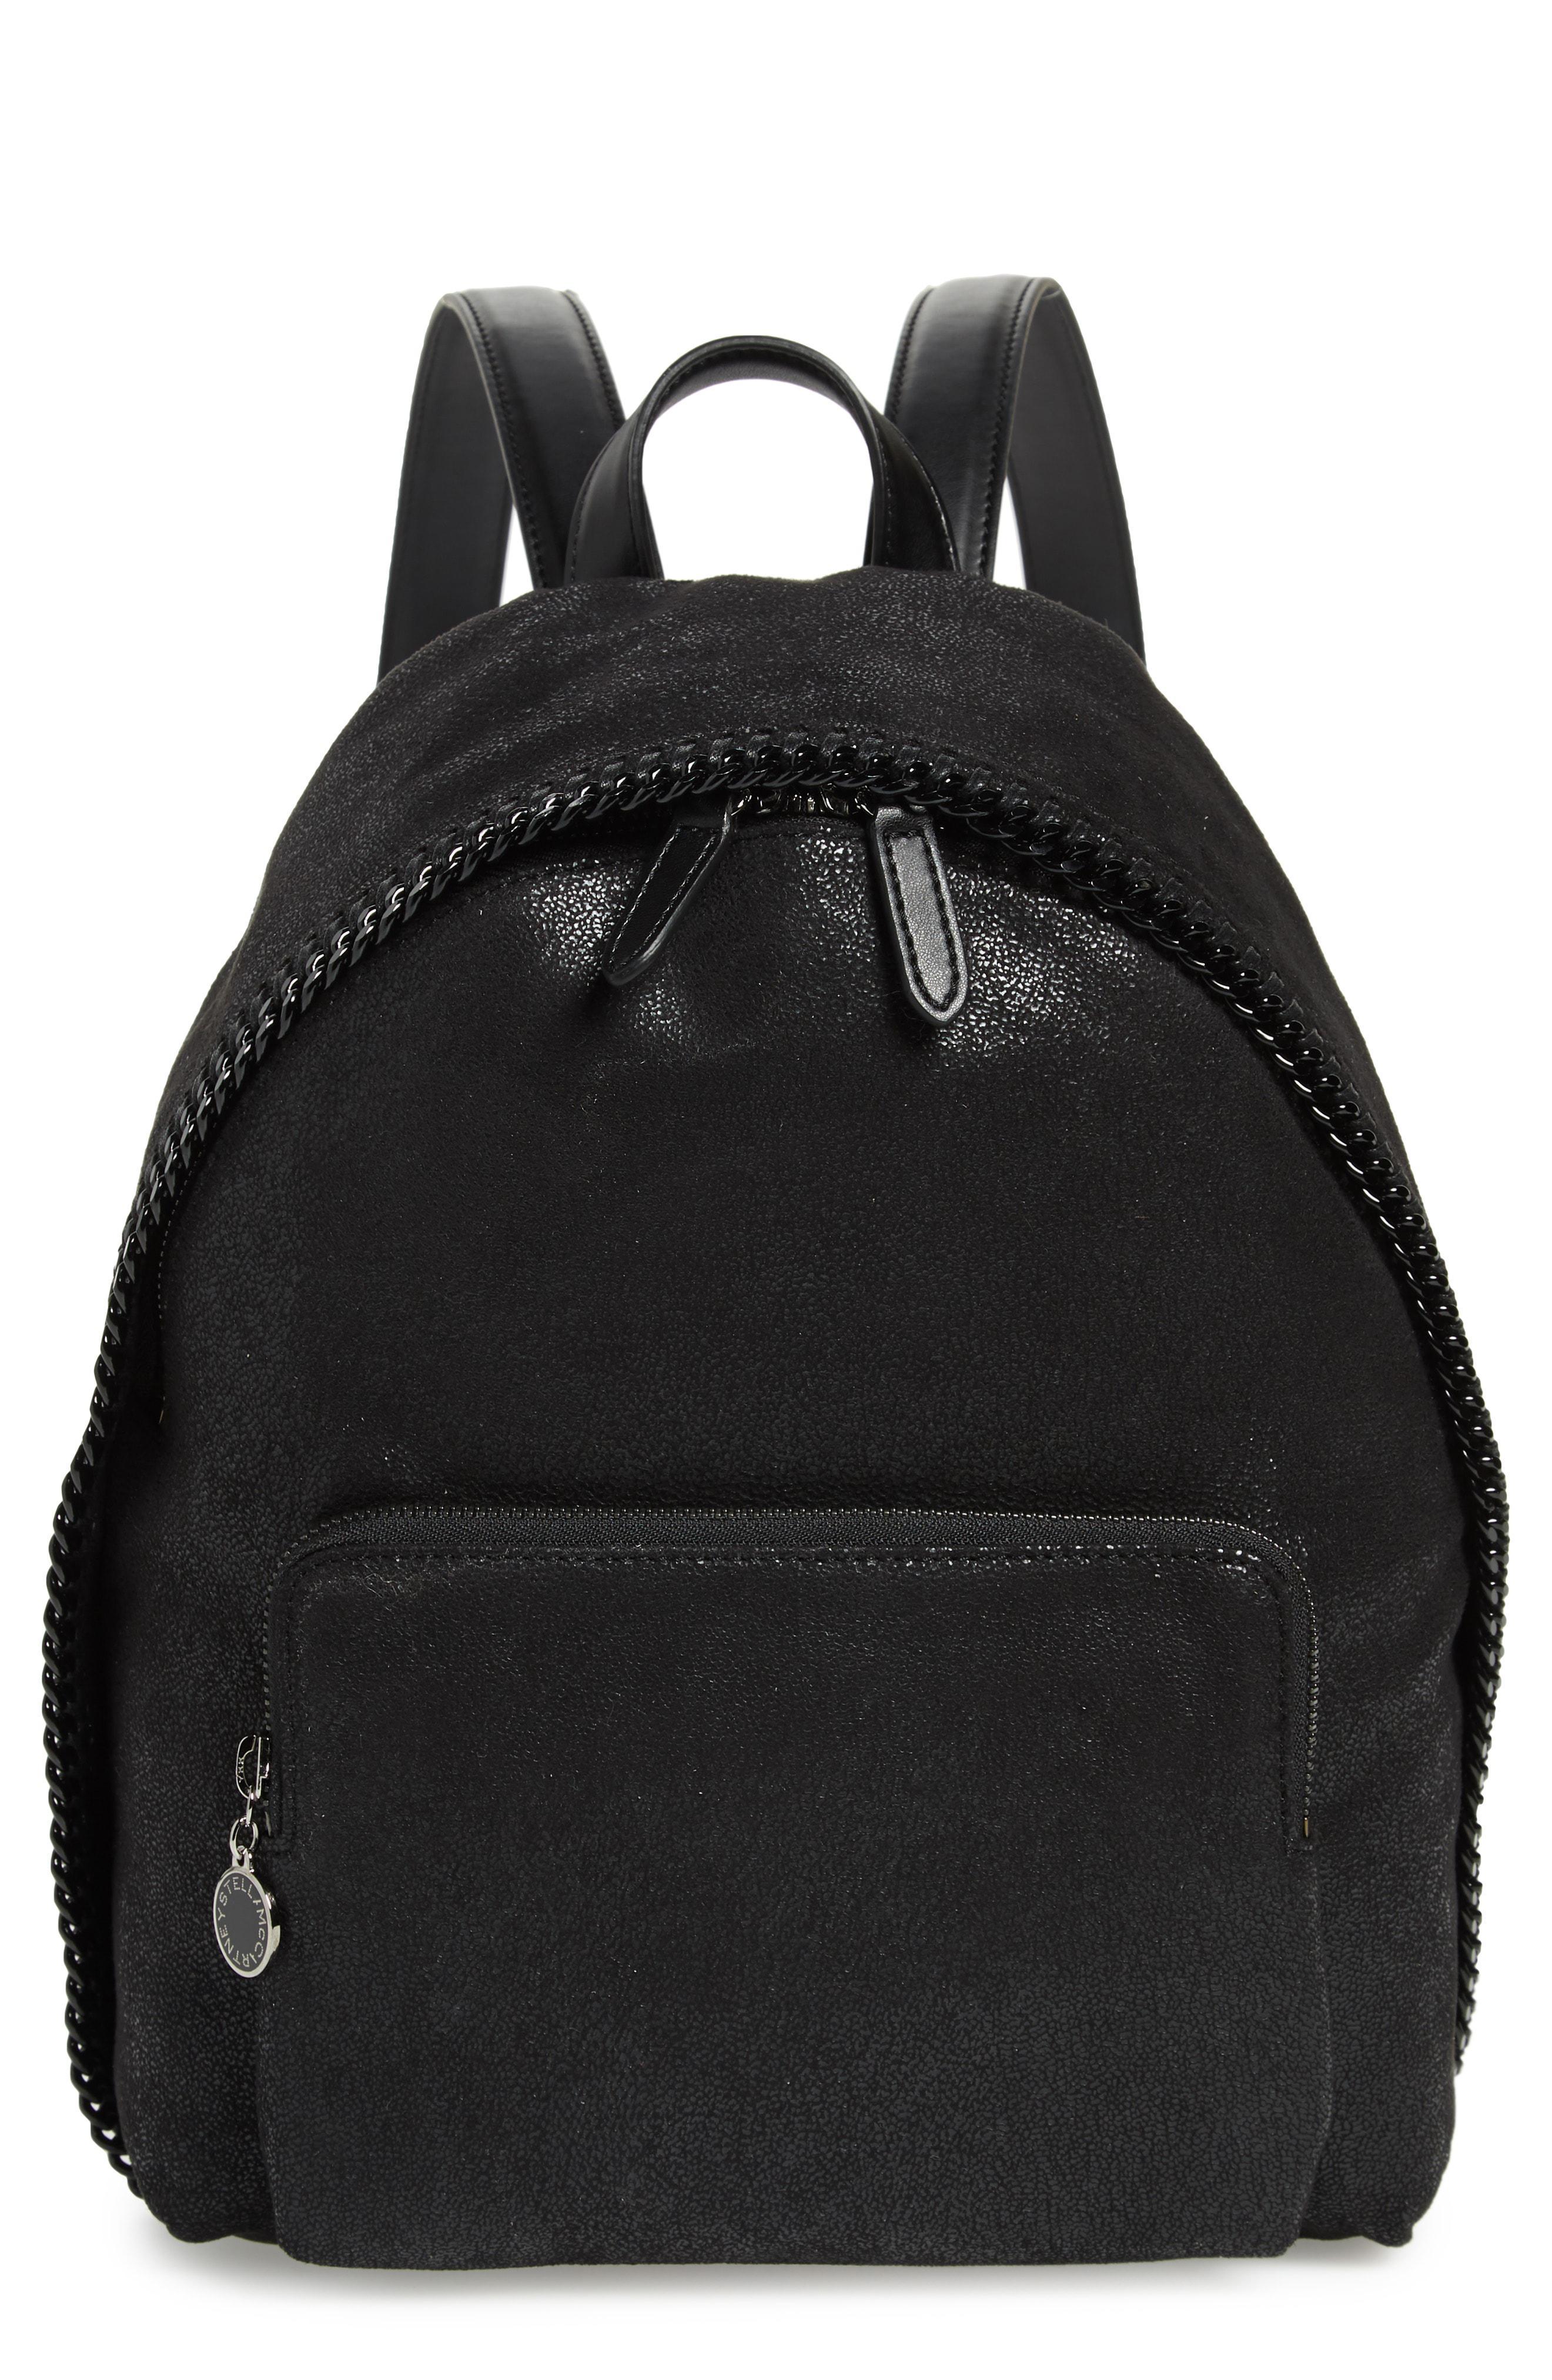 288fa0b99bf05b Lyst - Stella McCartney Small Falabella Faux Leather Backpack - in Black